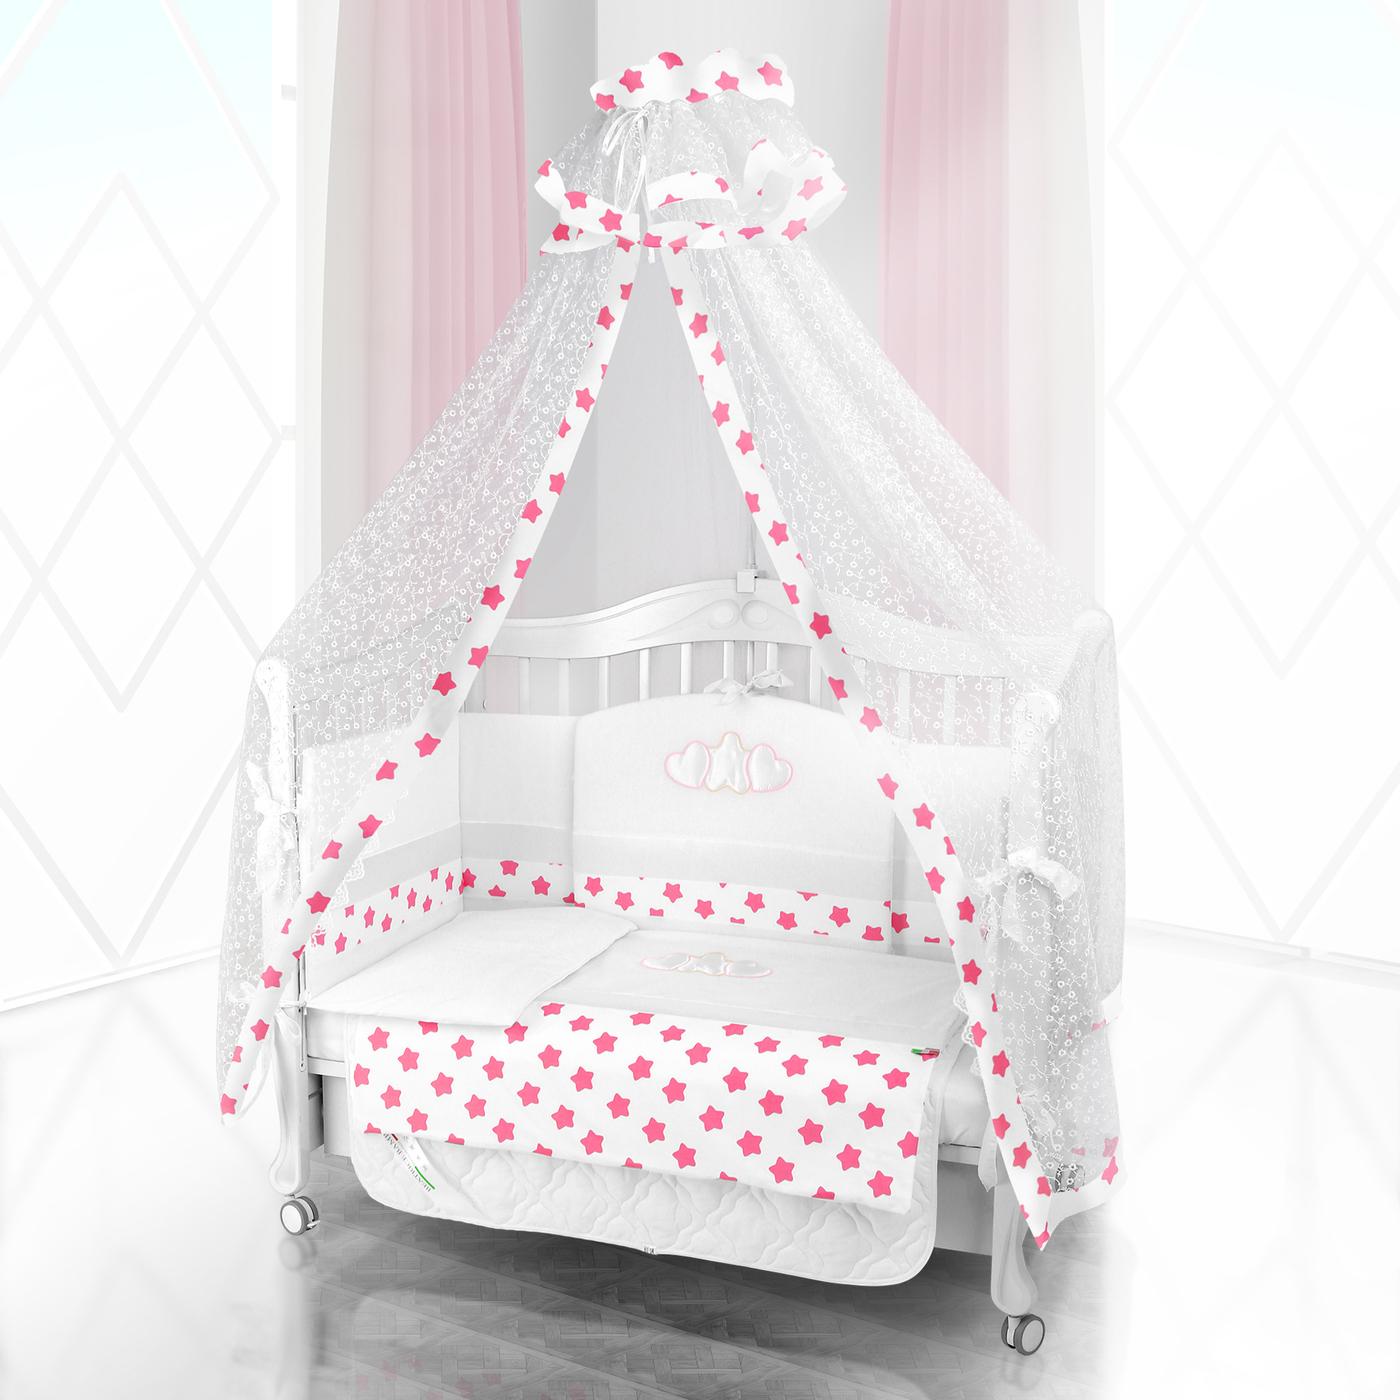 Комплект постельного белья Beatrice Bambini Unico Grande Stella (125х65) - bianco& rosa